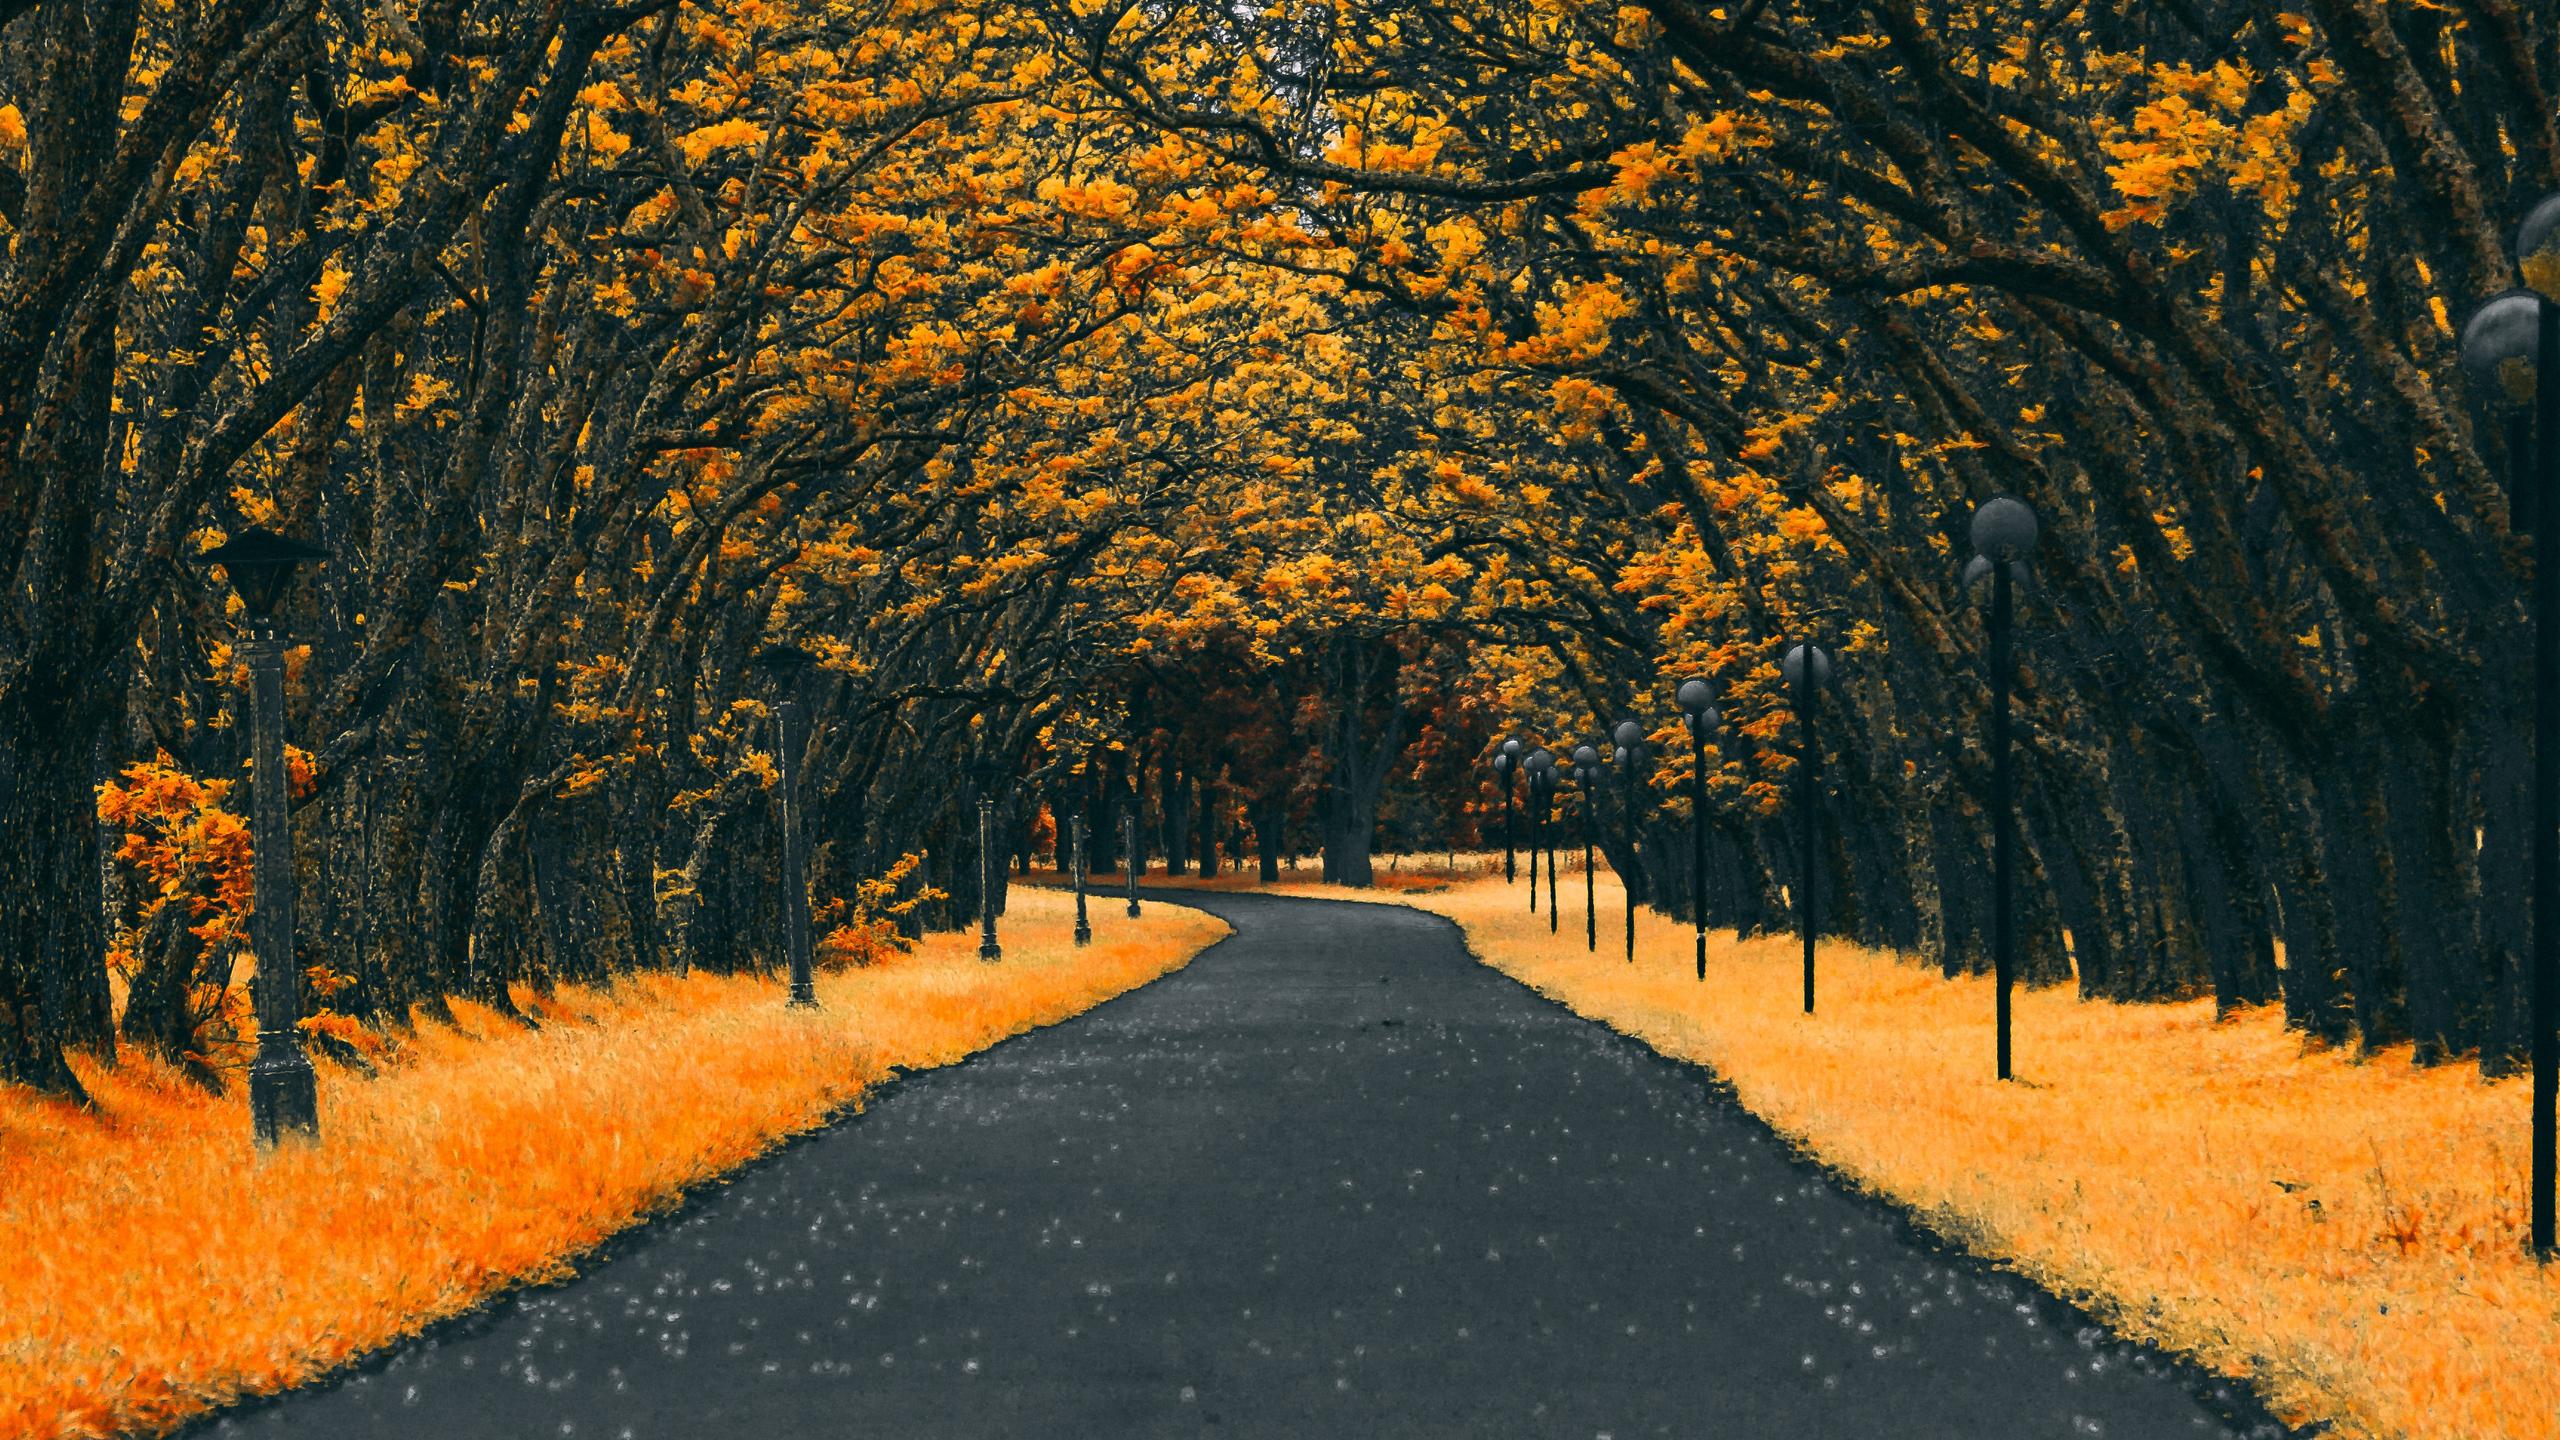 paved-road-autumn-4k-g7.jpg